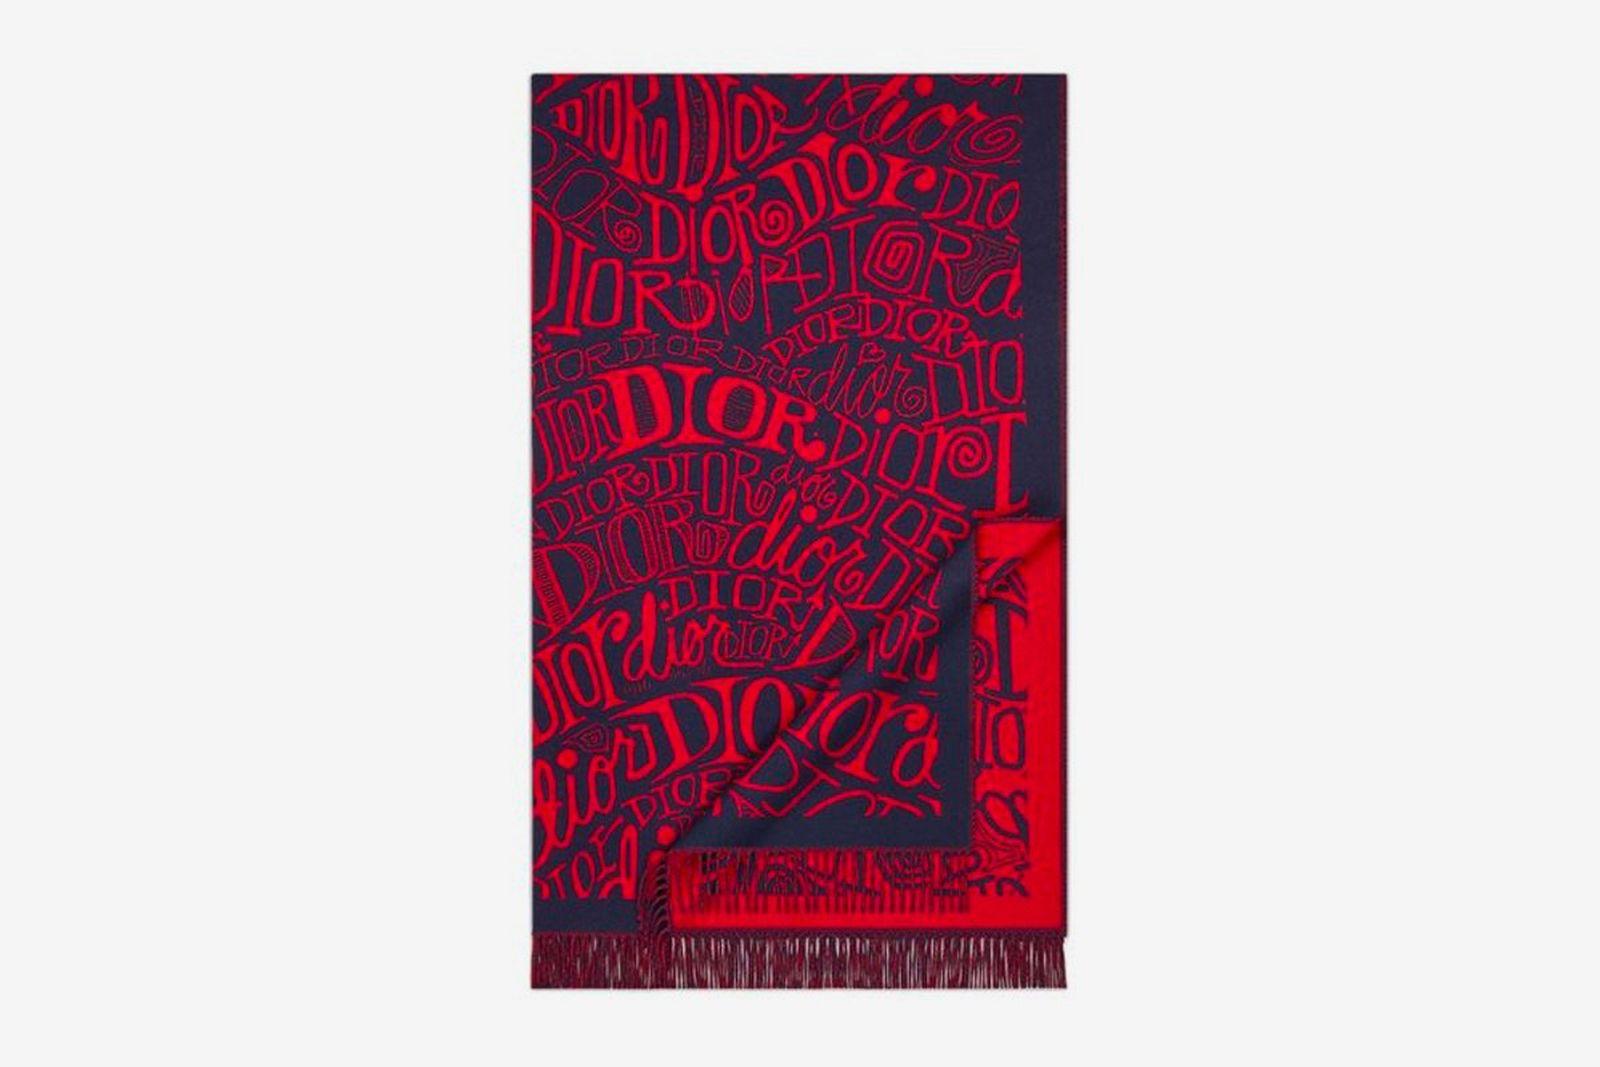 shawn-stussy-dior-b27-release-date-price-1-19